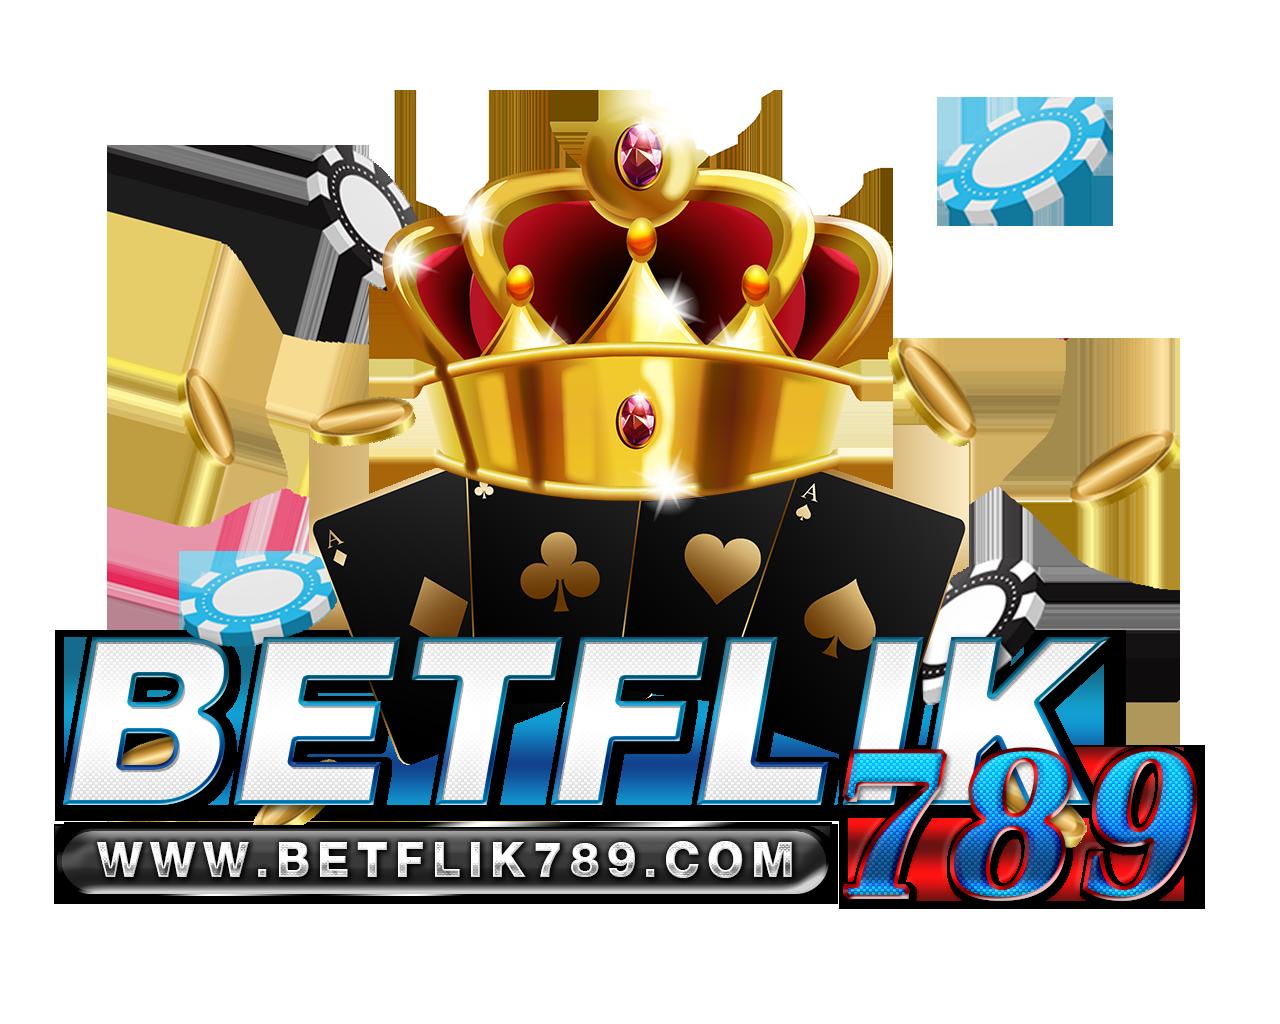 betflik285